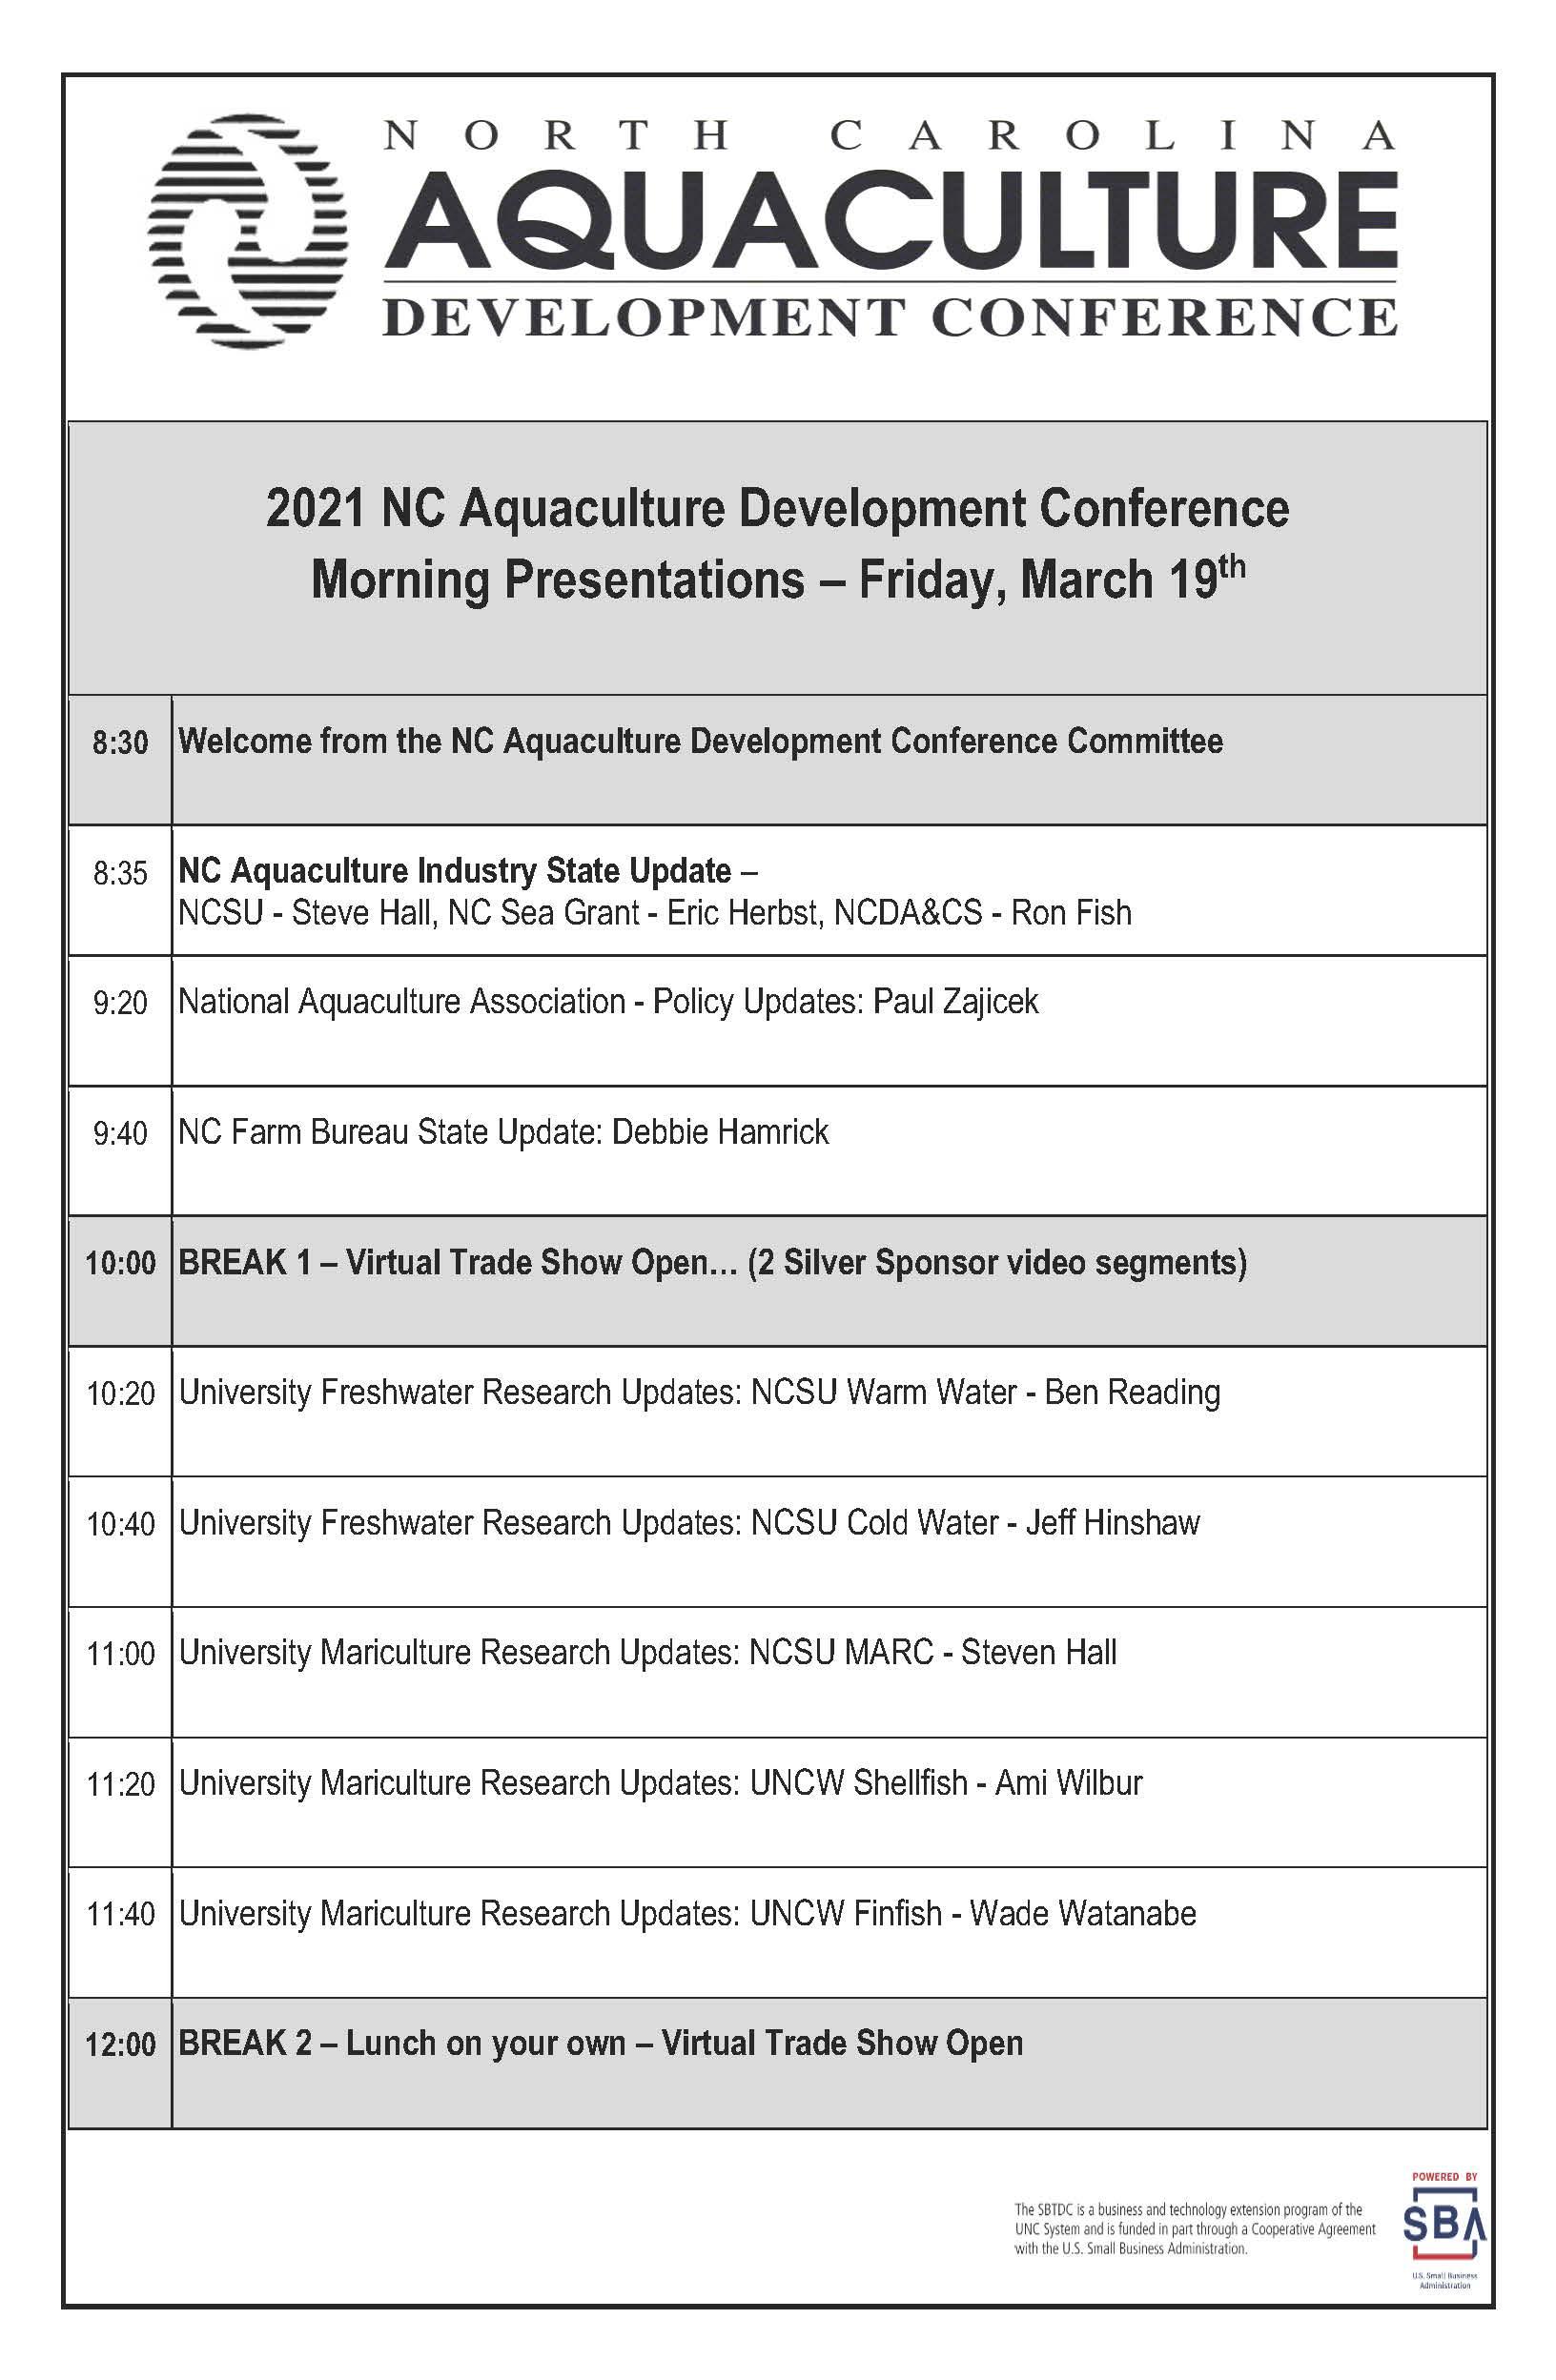 Friday conference agenda